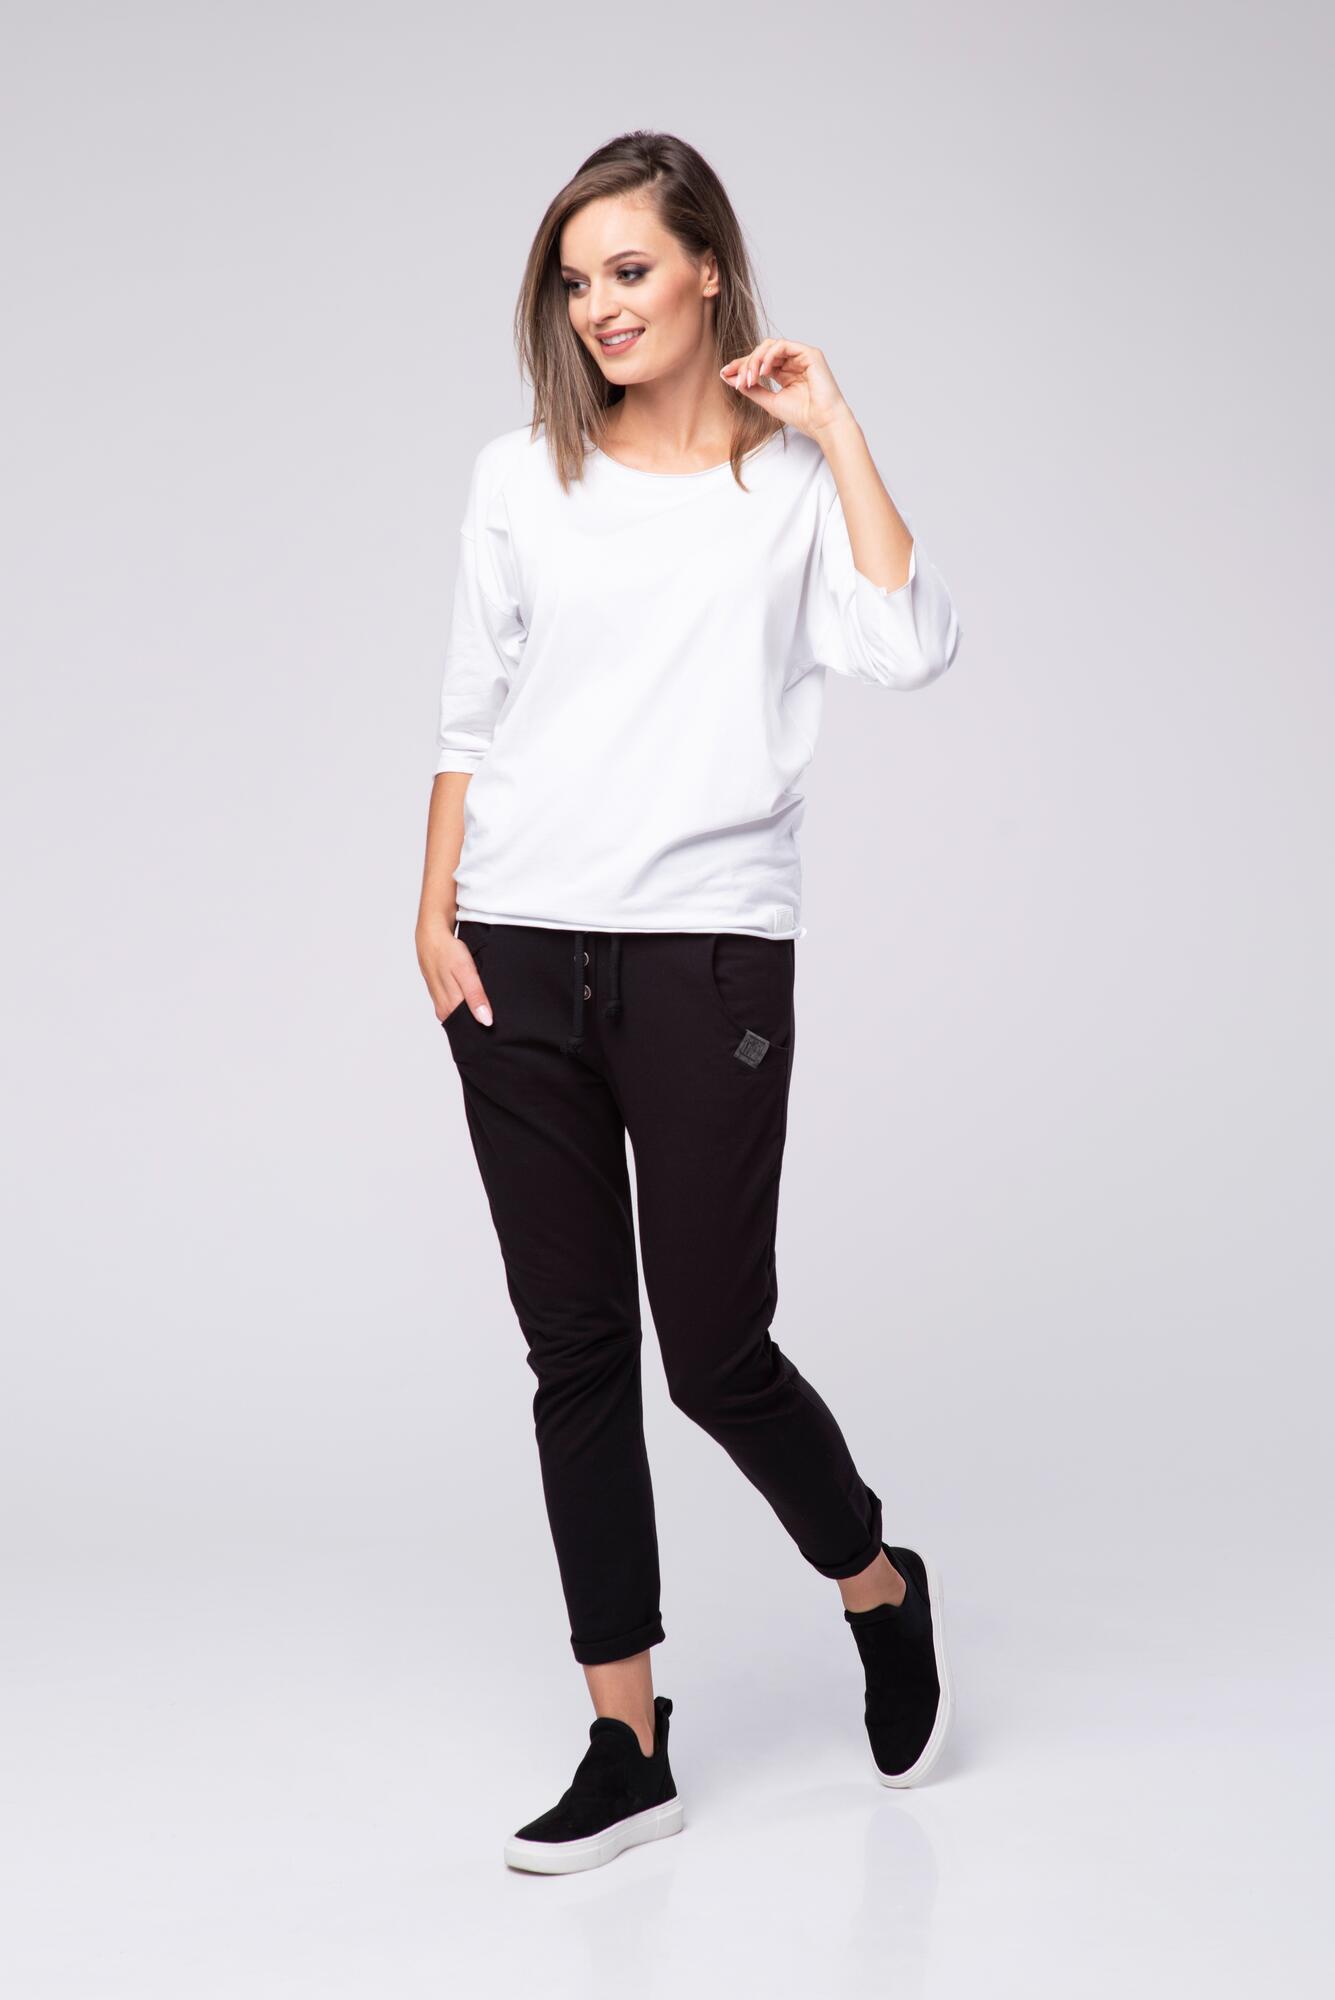 T-shirt bawełniany Kim Look 602 - LOOK made with Love   JestemSlow.pl